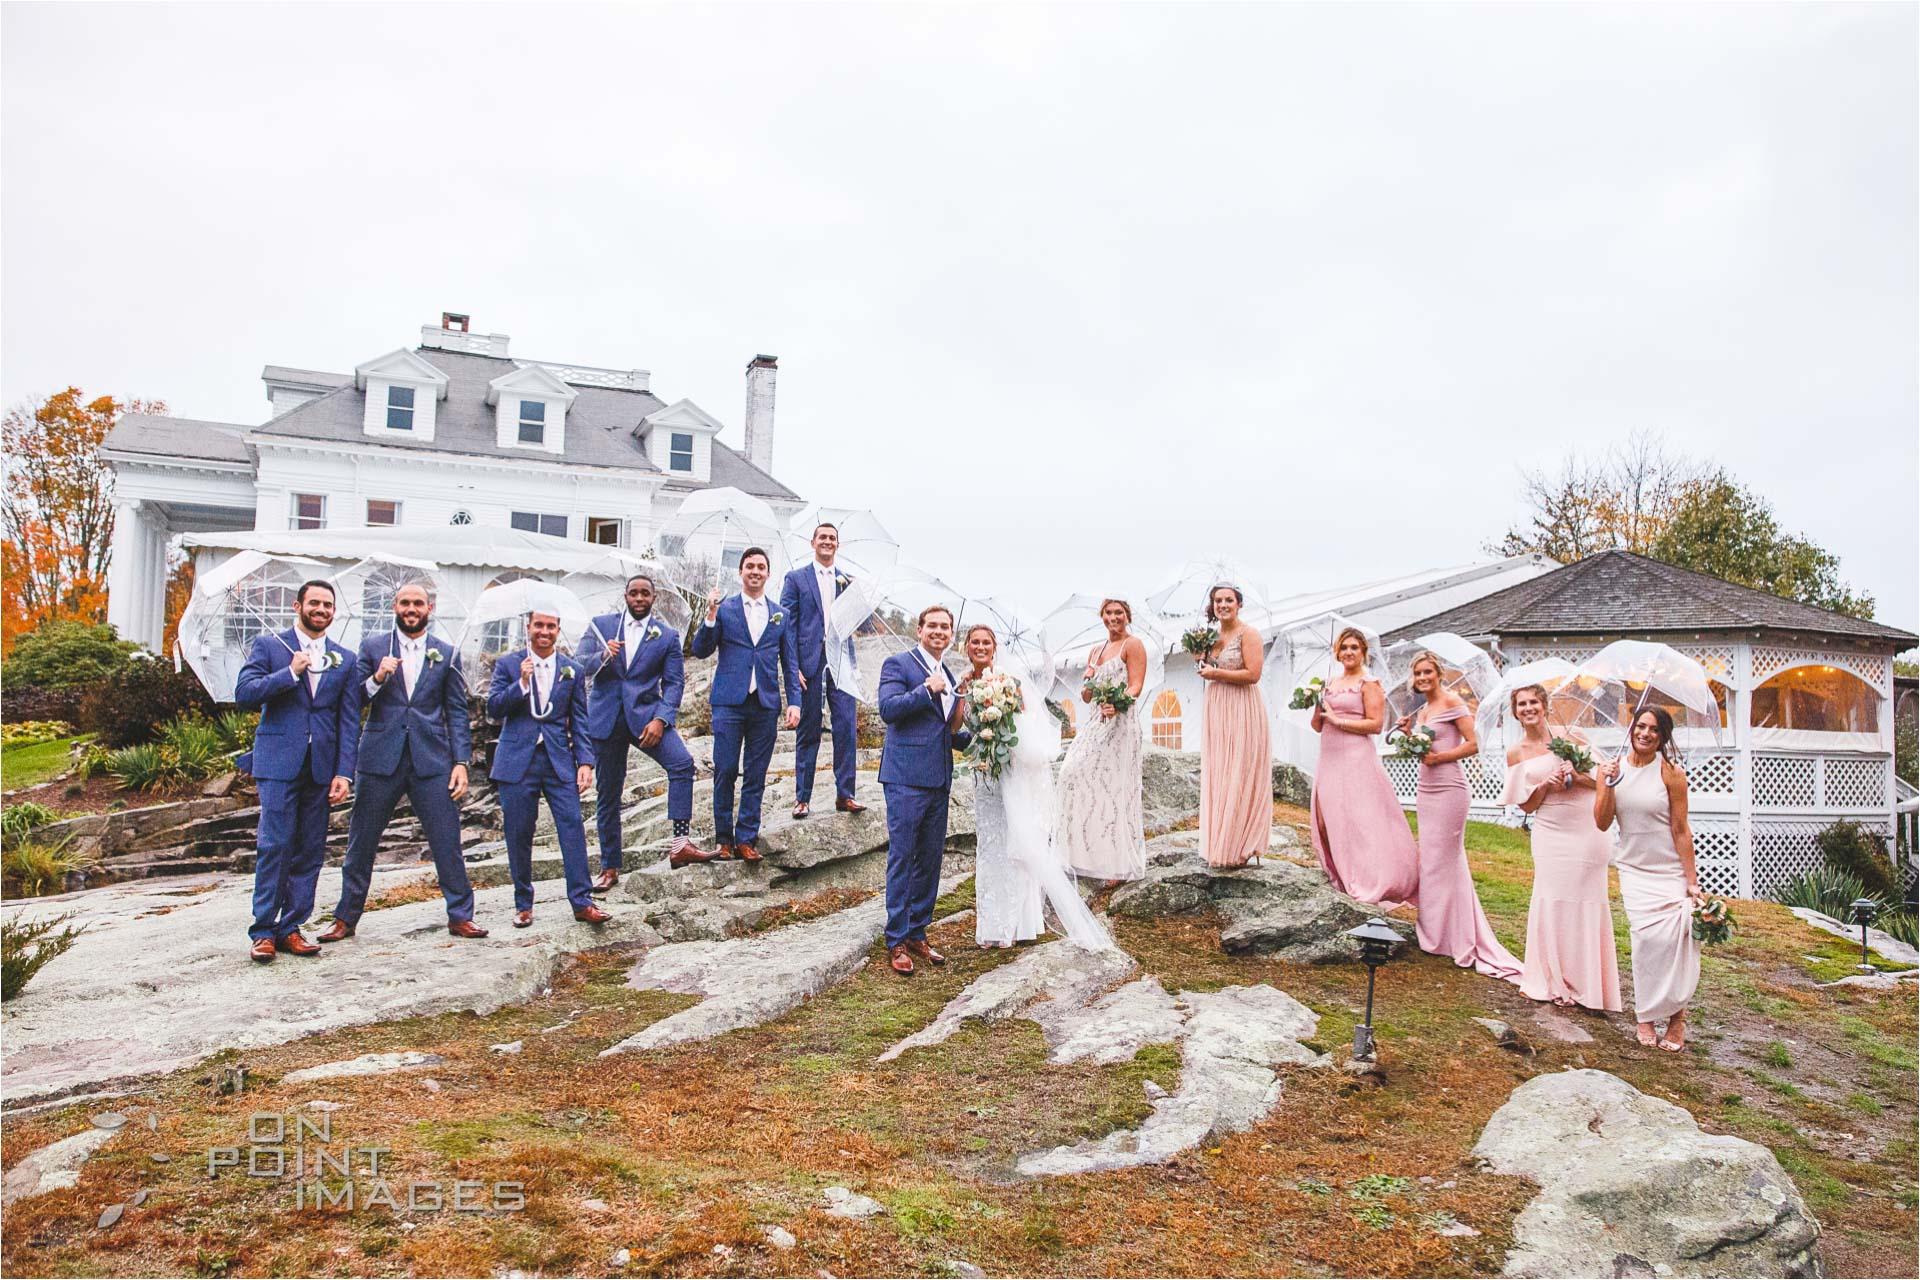 inn-at-mystic-wedding-photography-18.jpg